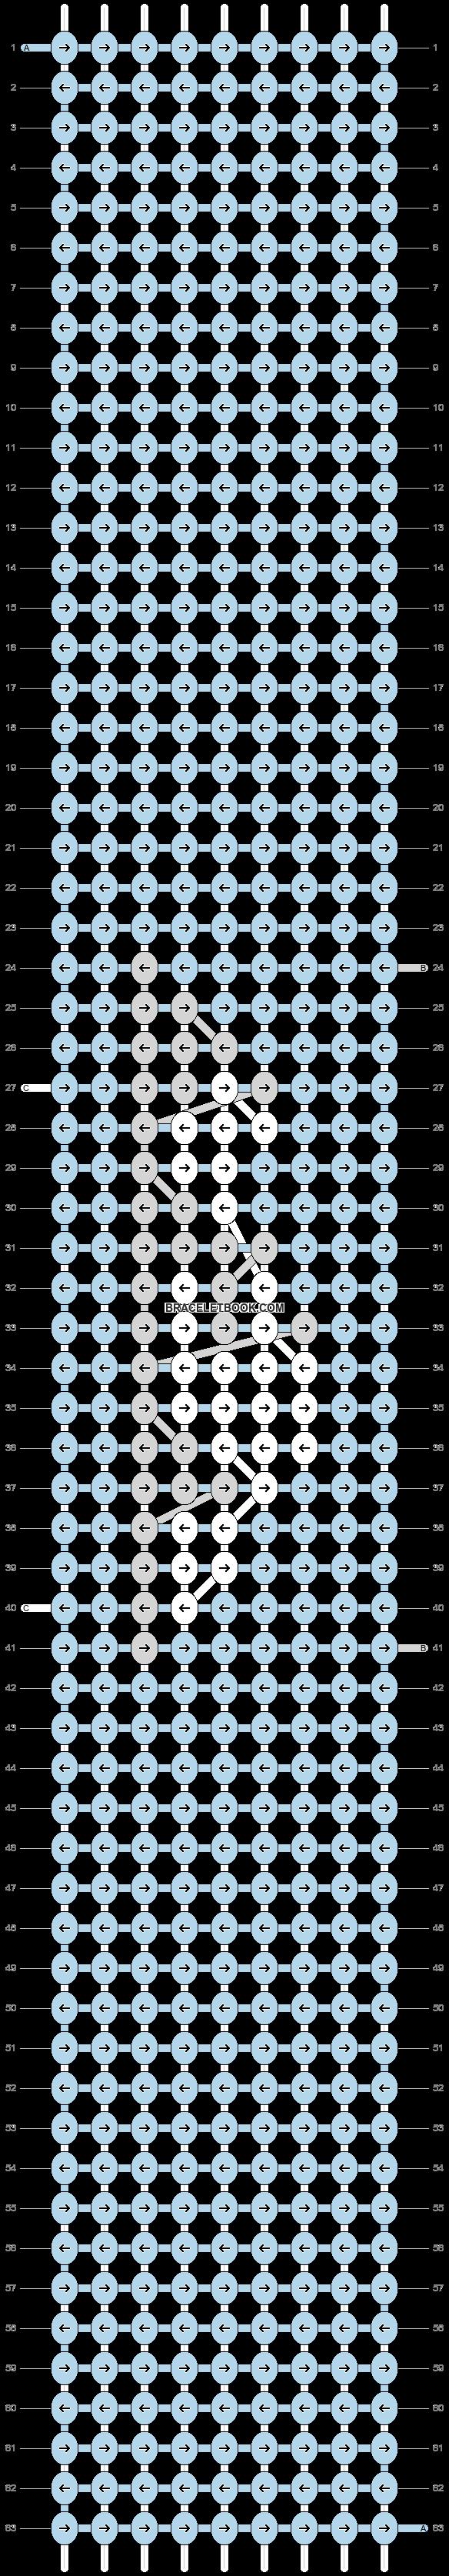 Alpha pattern #50477 pattern